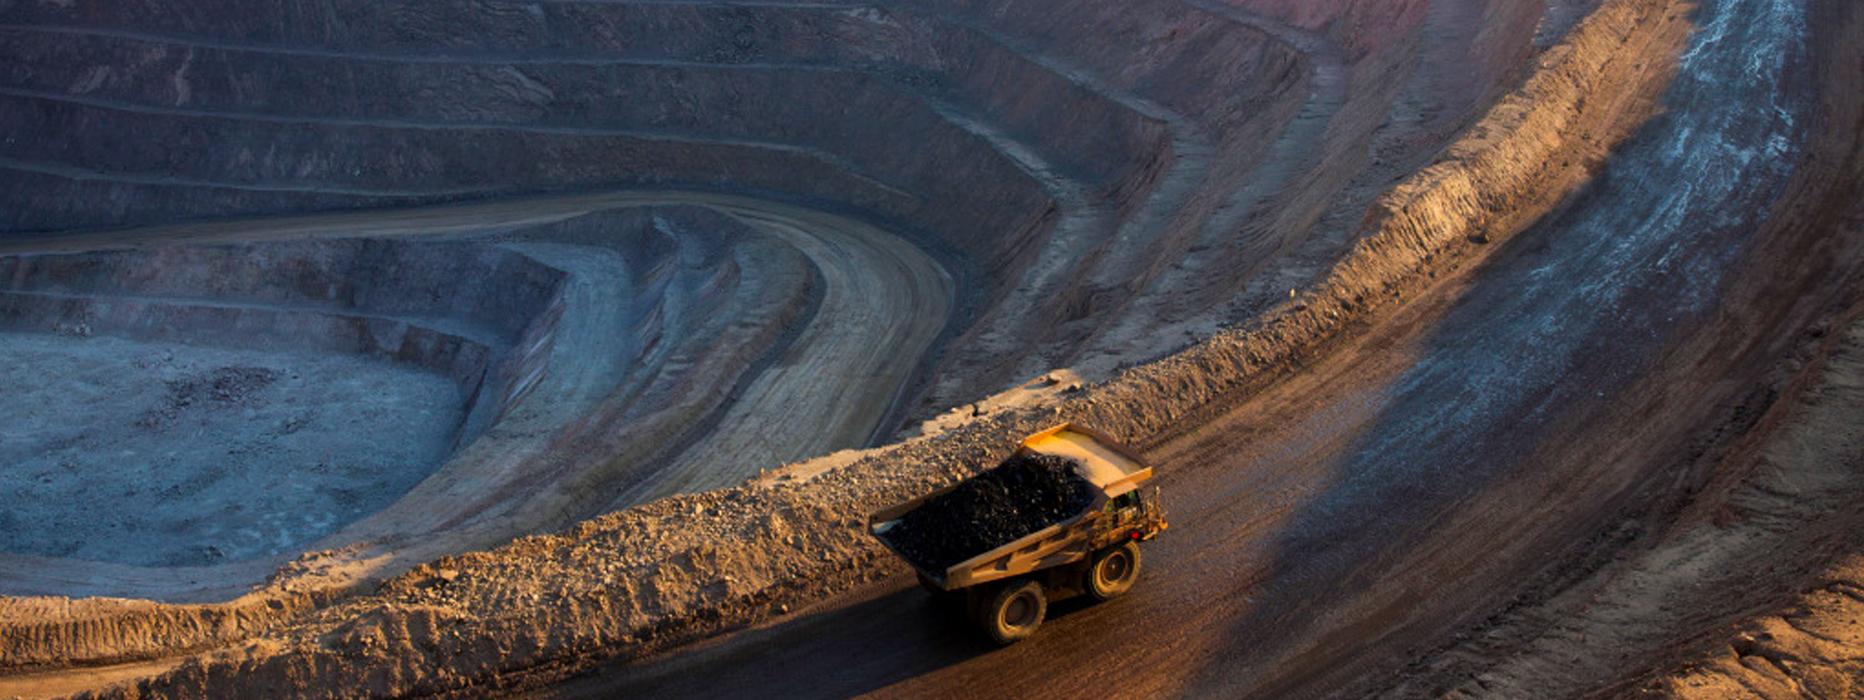 Glencore's Katanga unit halts cobalt exports from Kamoto mine